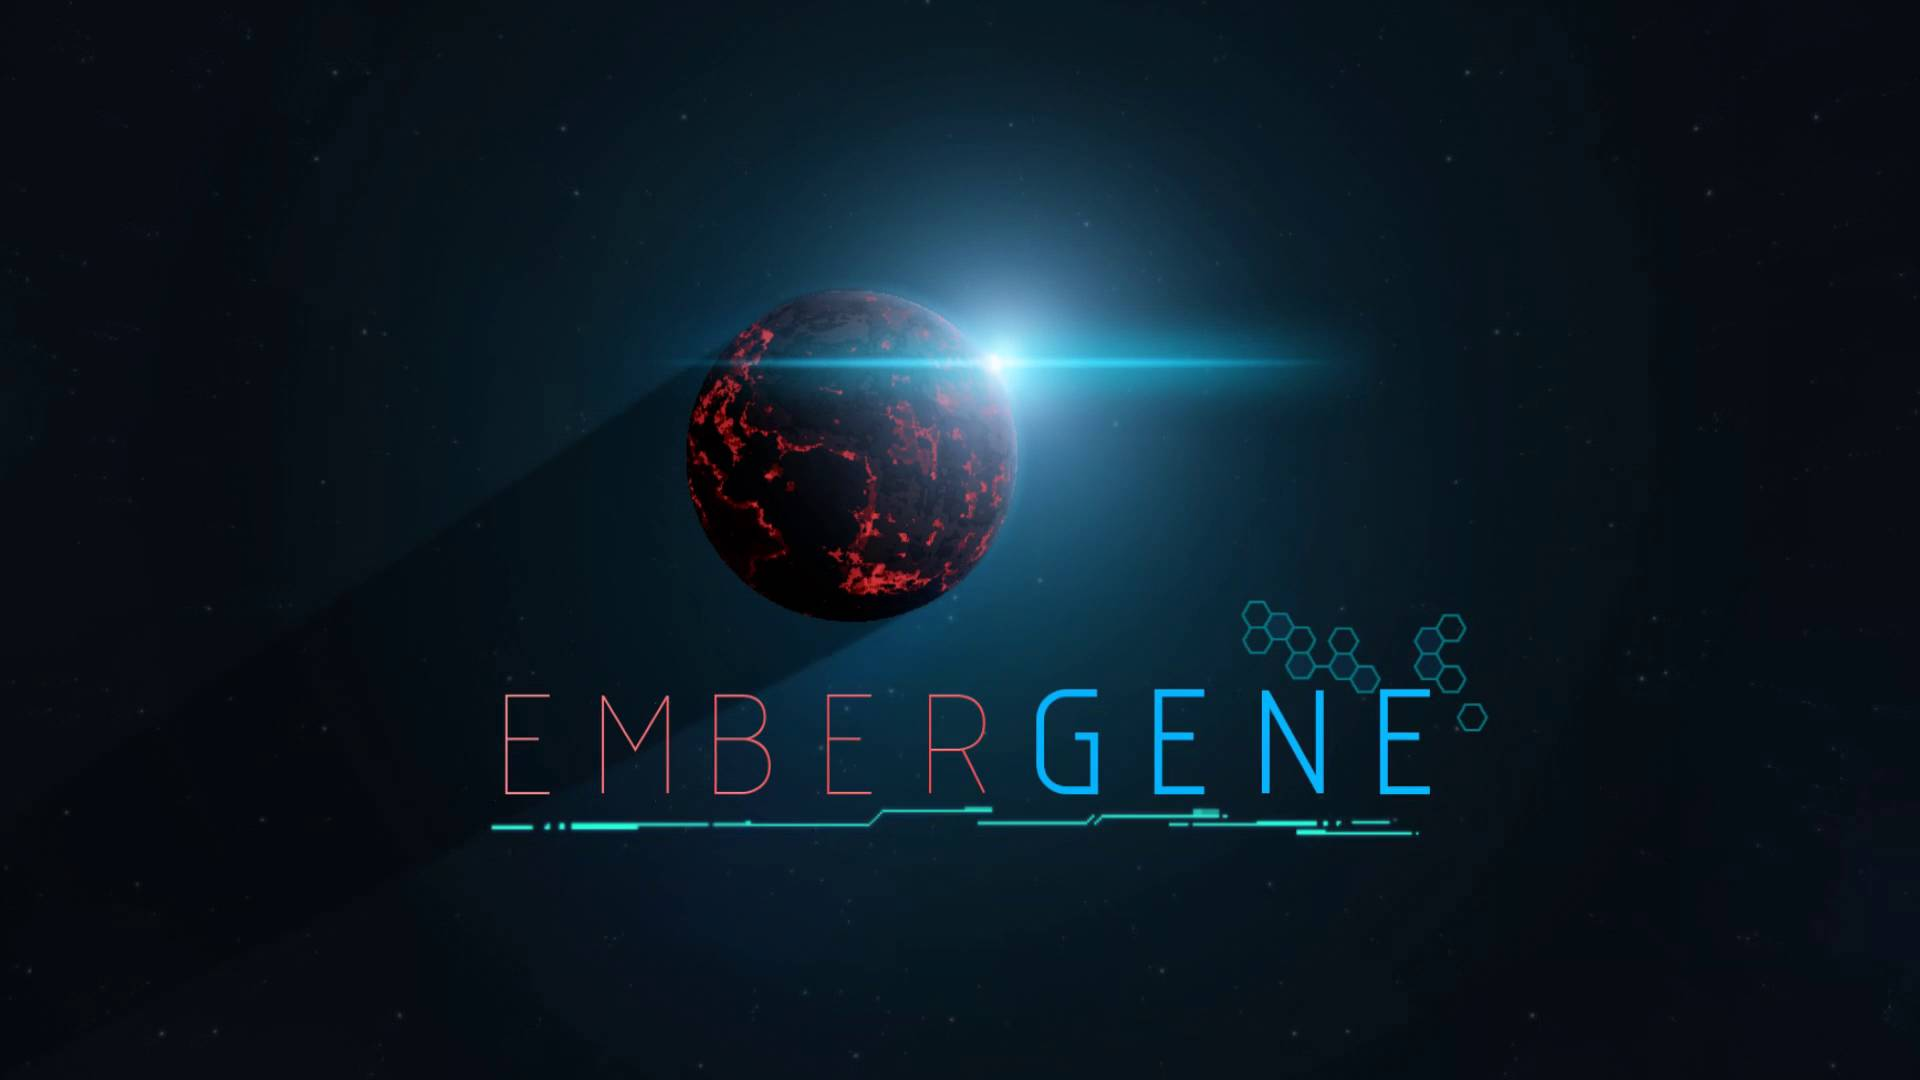 Embergene